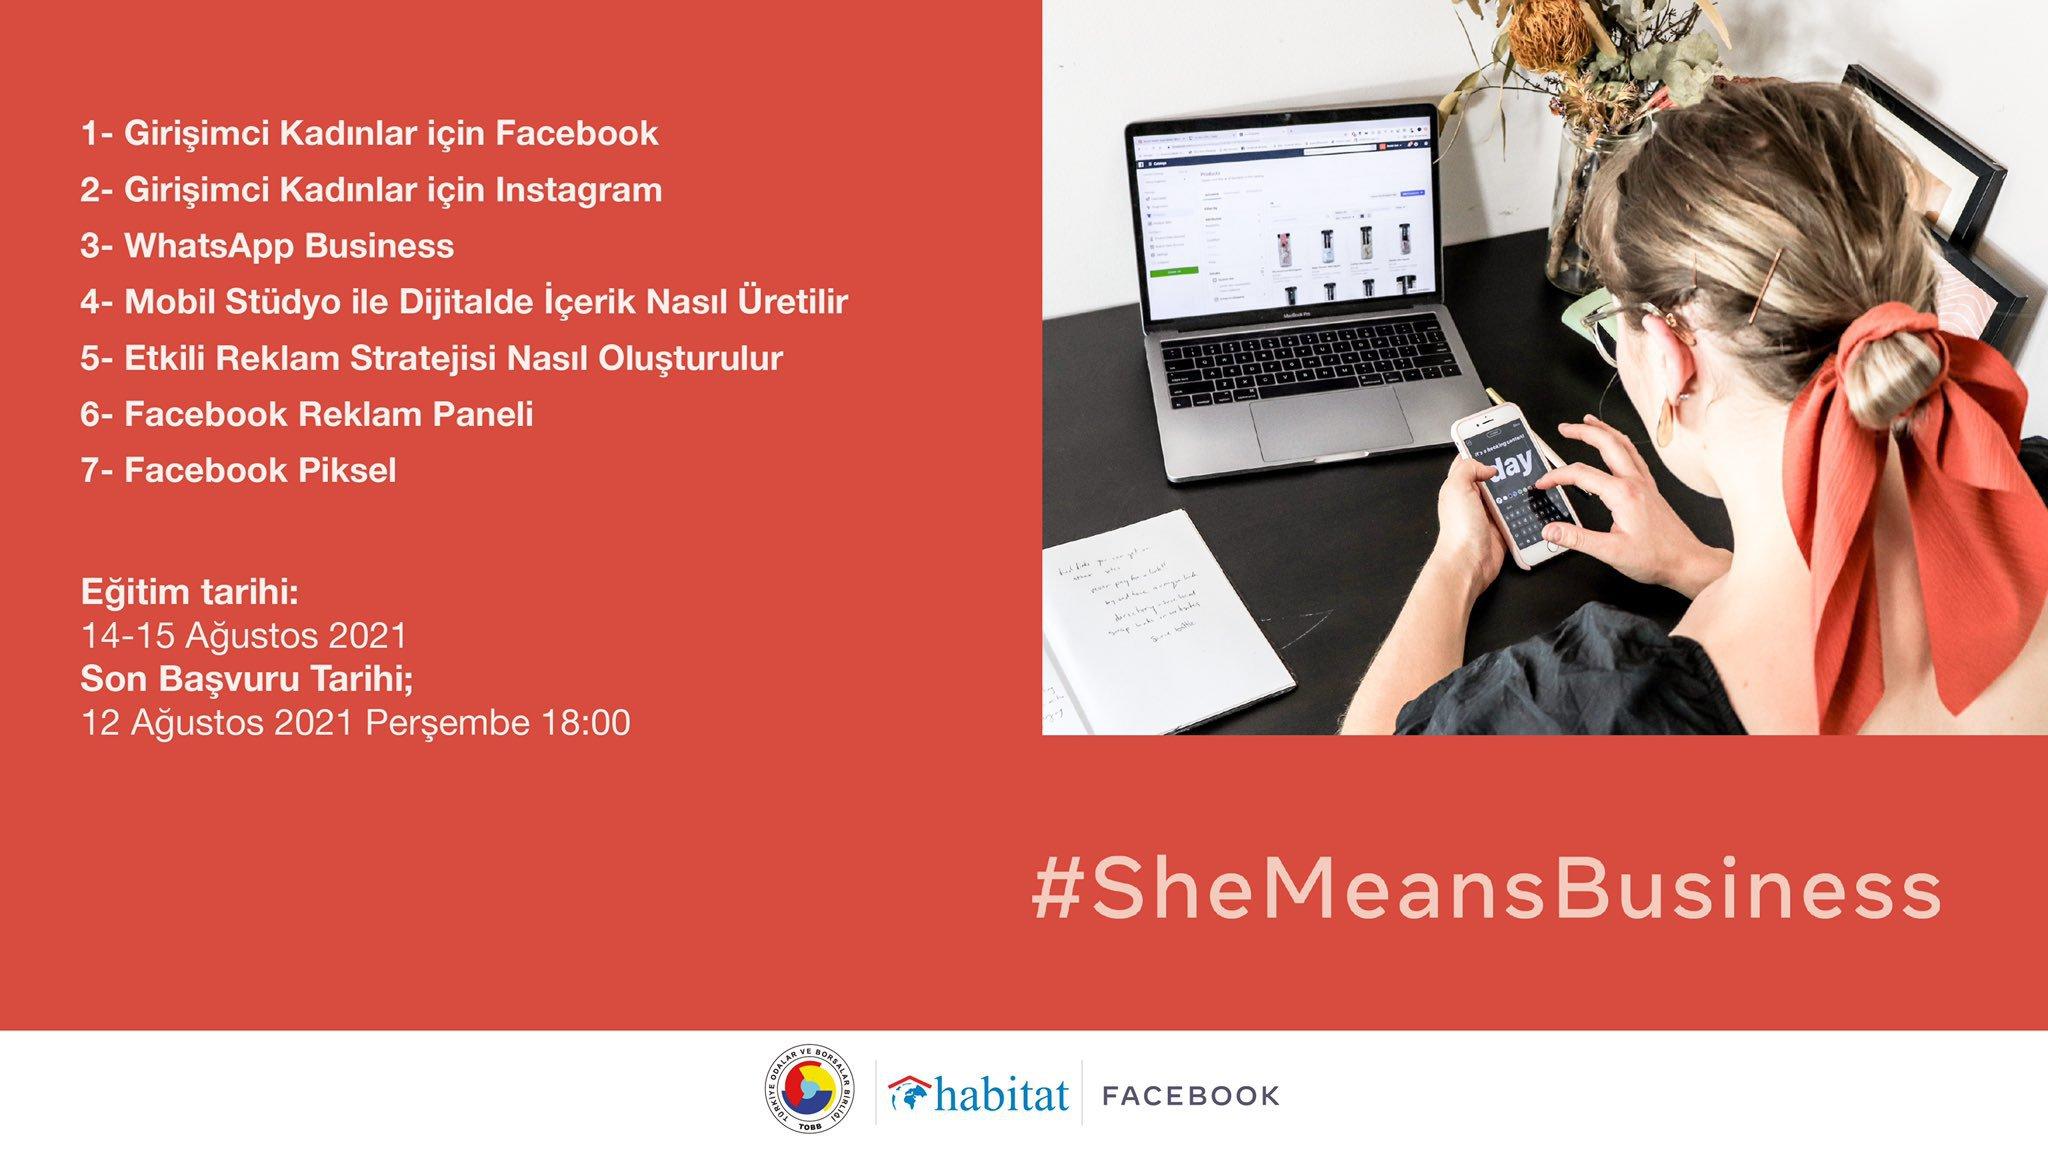 #Shemeansbusiness Programı